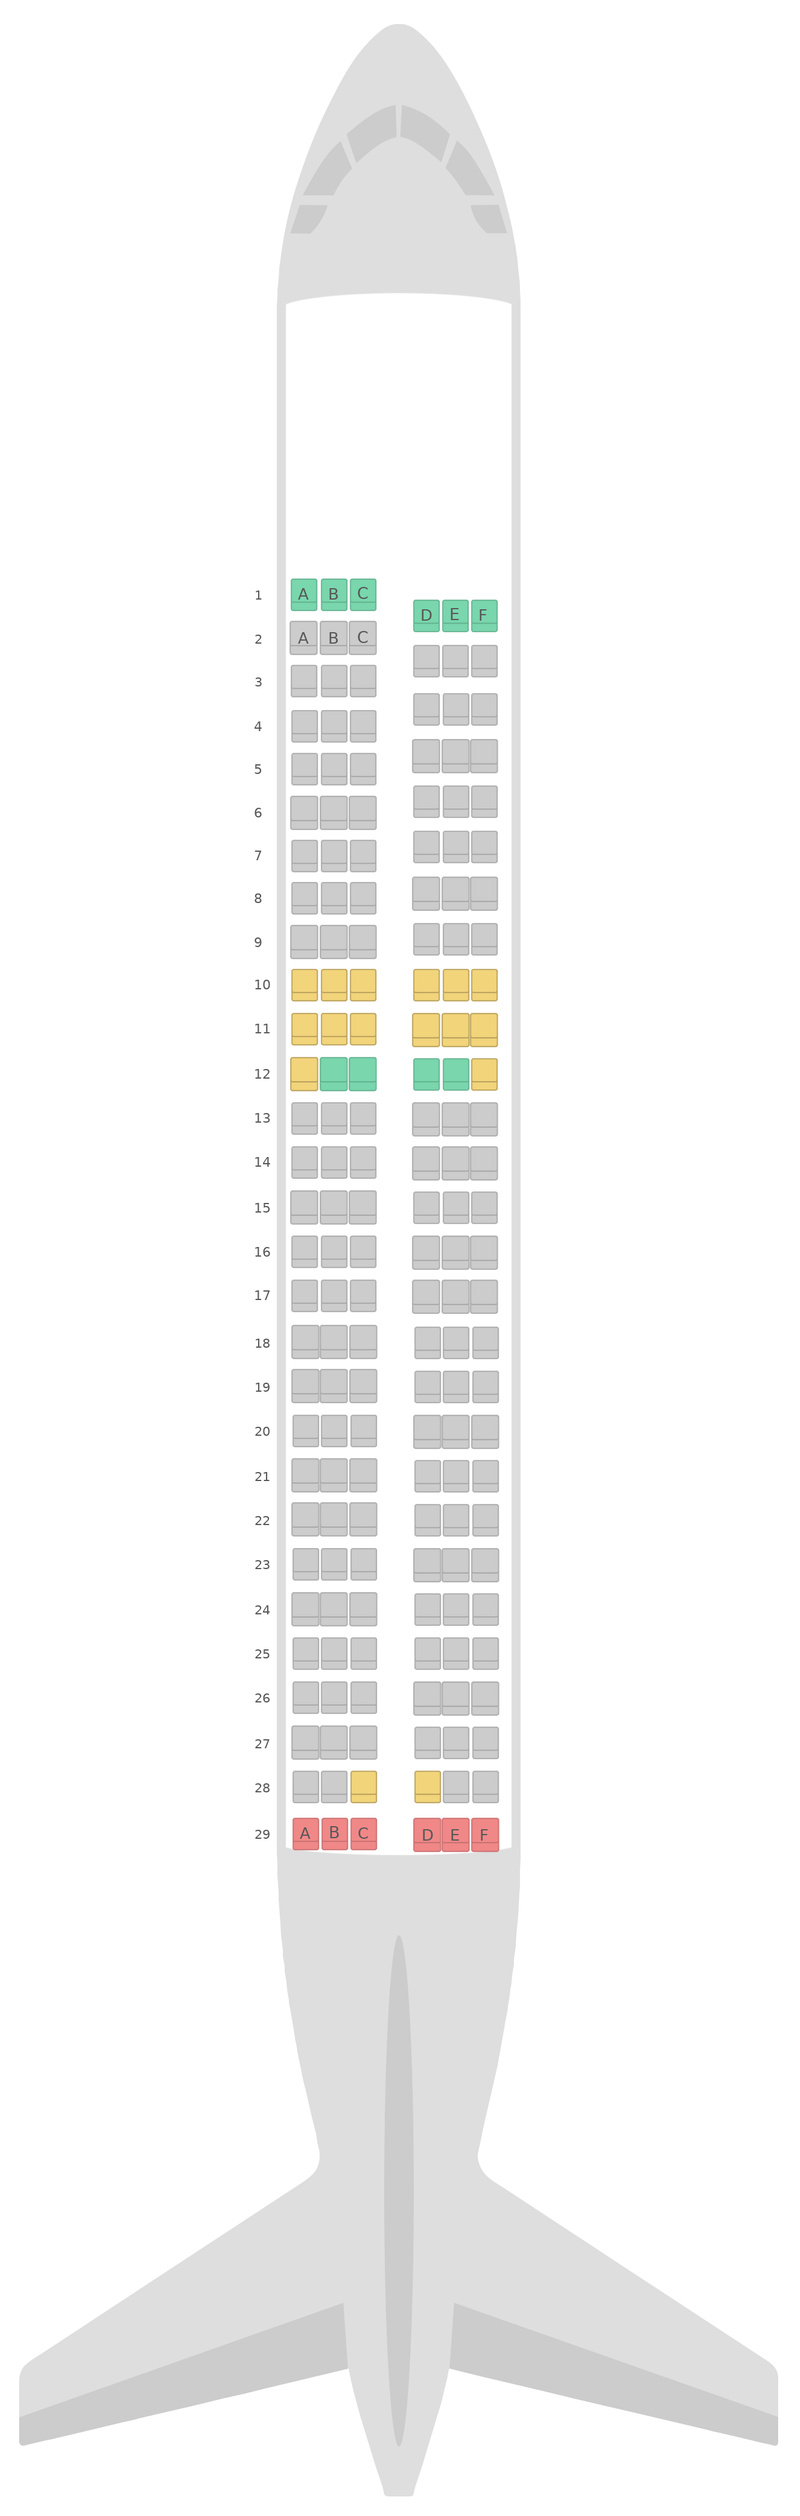 Sitzplan Airbus A320 Domestic Air New Zealand